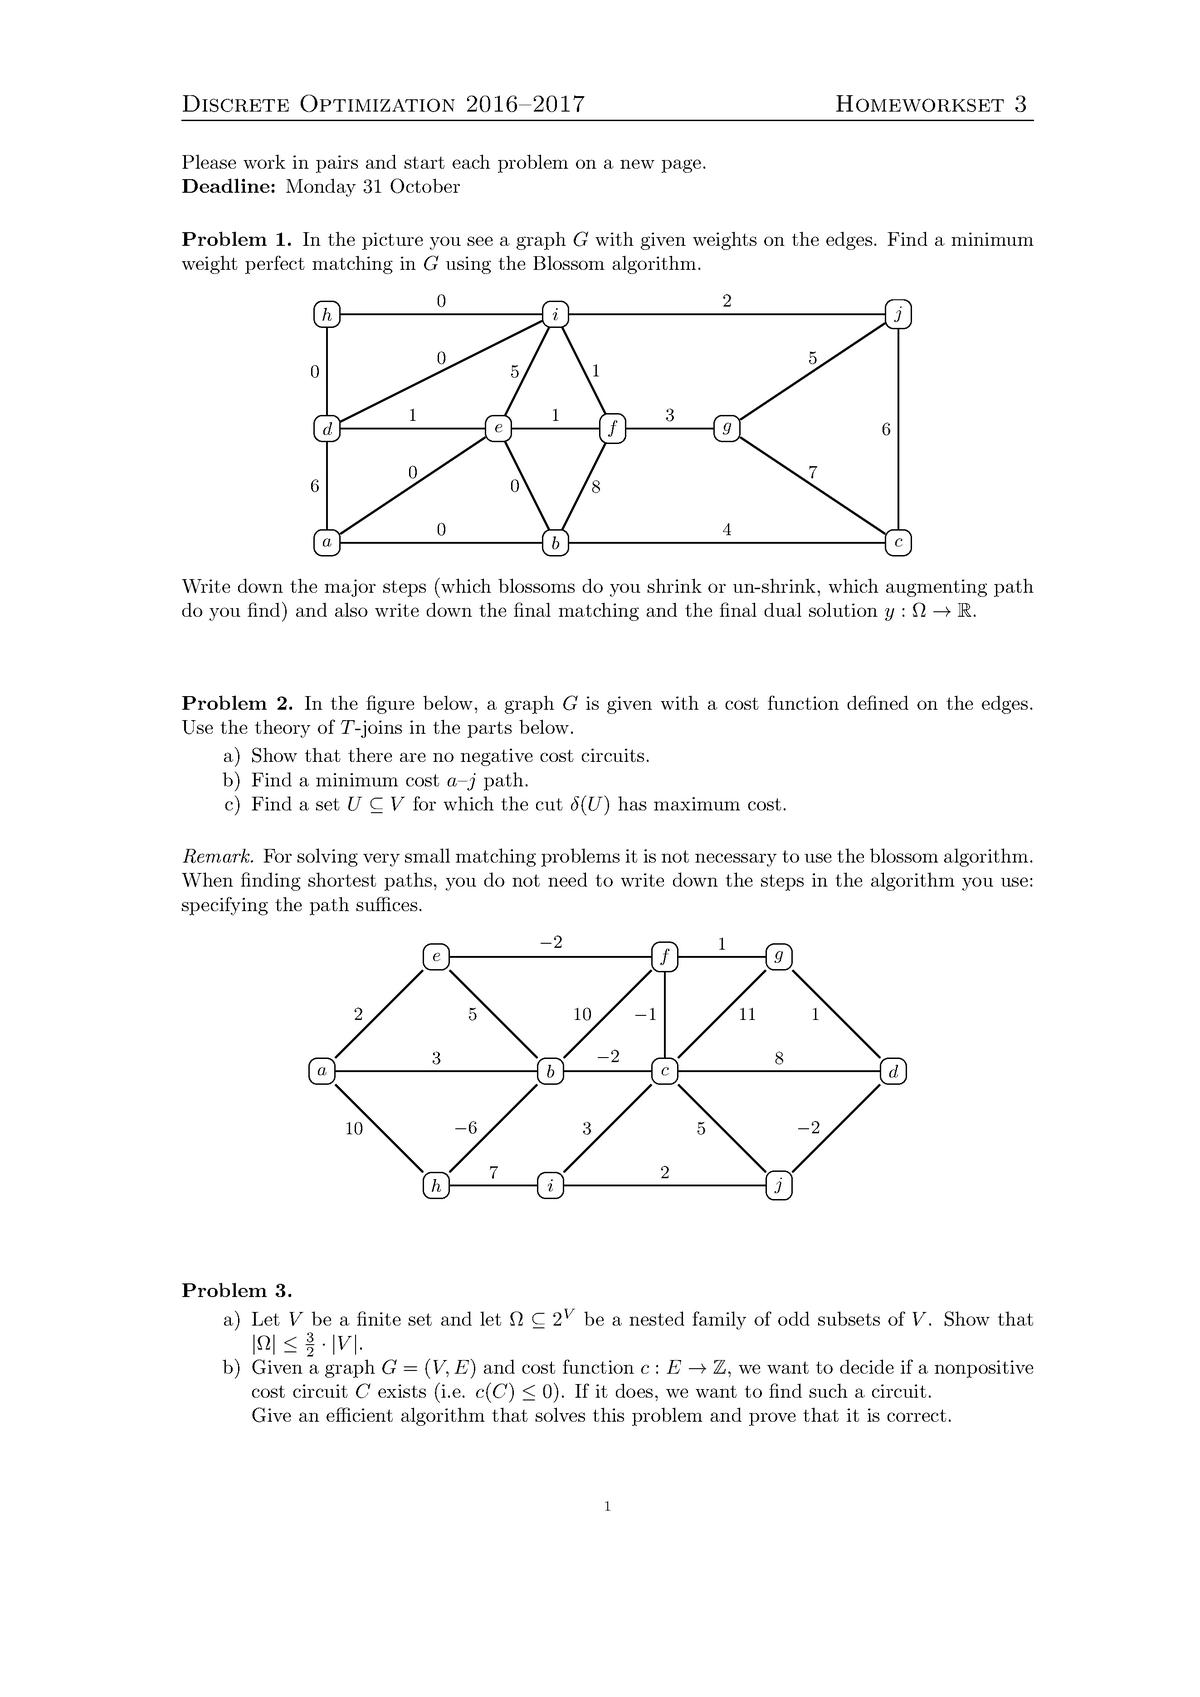 Huiswerk Opgave 3 & 4 - WI4219: Discrete Optimization